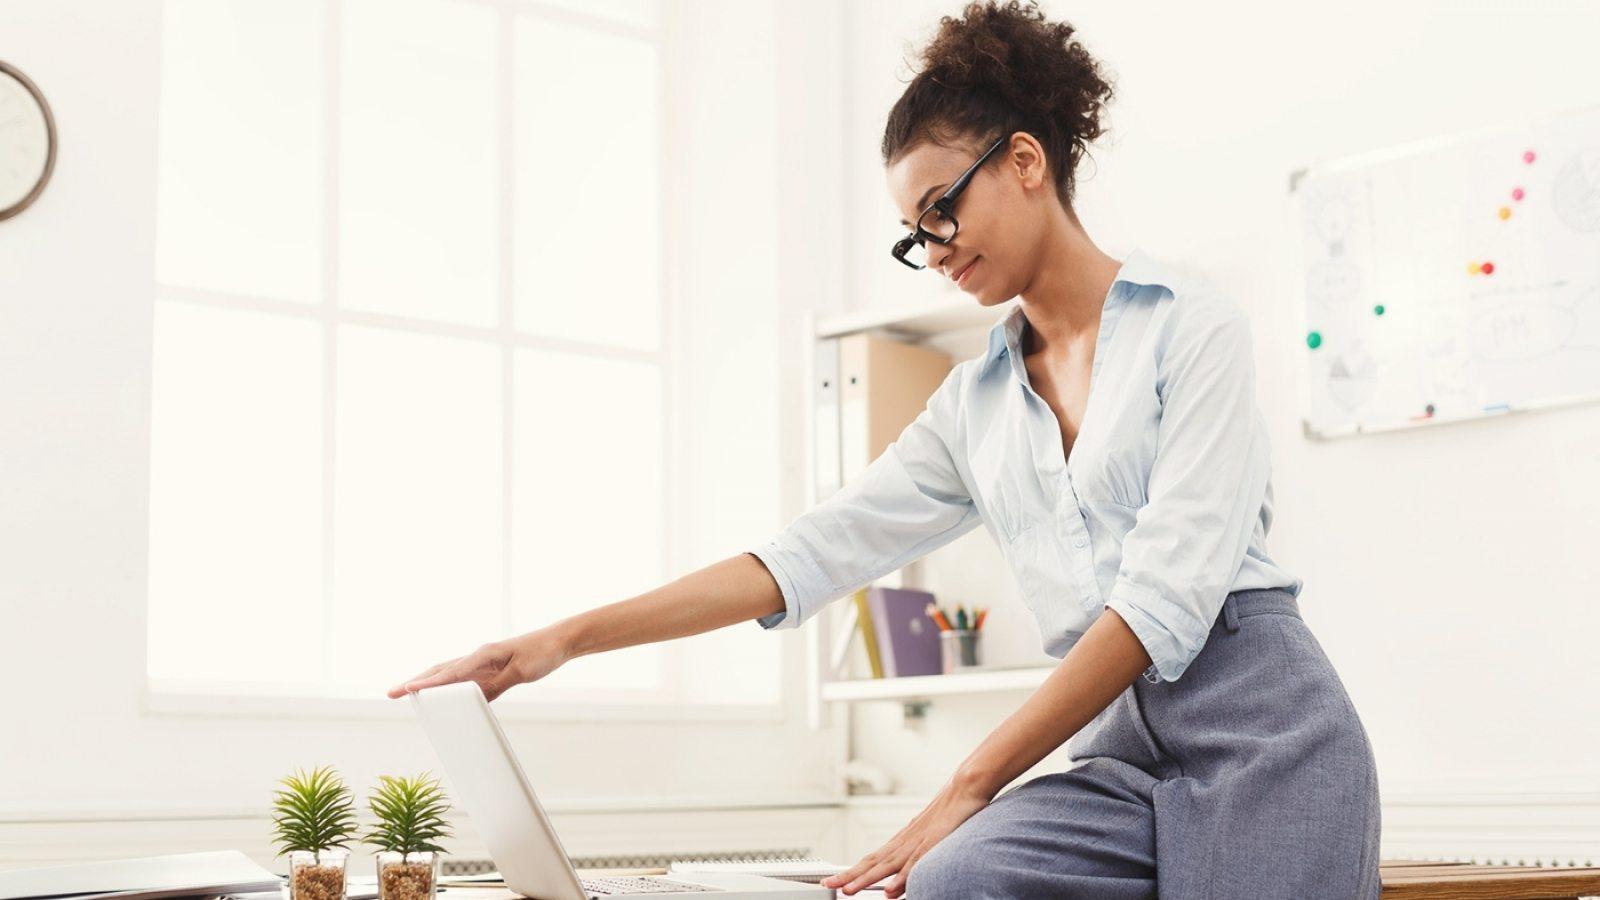 business-woman-opening-laptop-at-office-PU4ZAGW